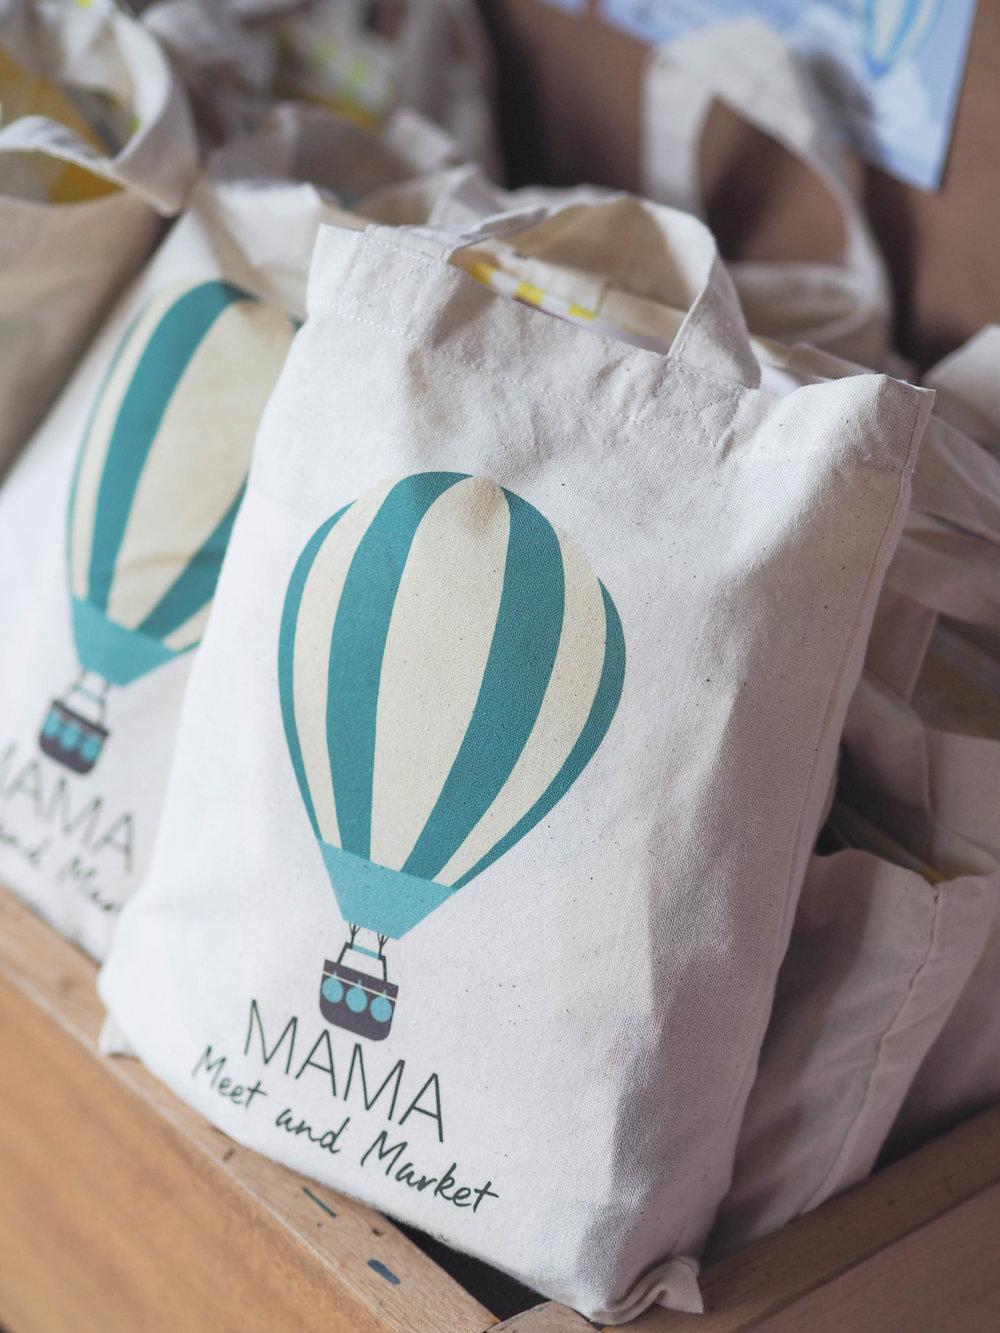 MAMA Meet & Market - September 2017 (c) The Mrs Project (6 of 154).jpg